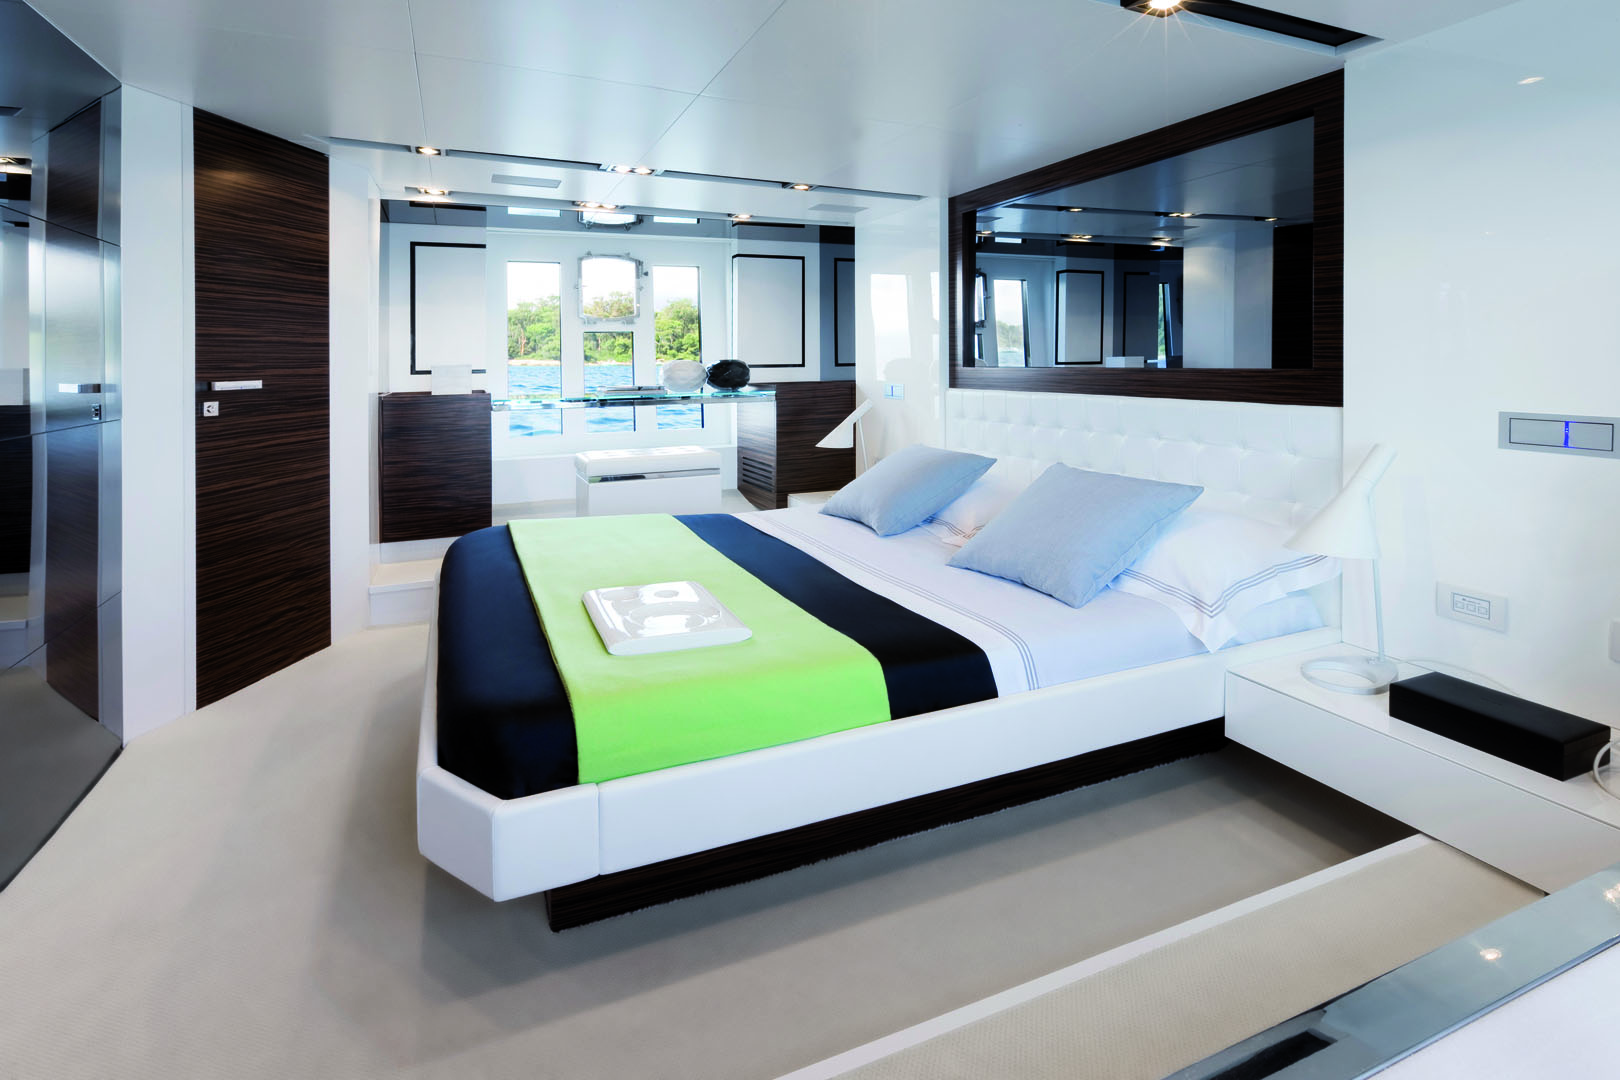 70 Sty - Interiors